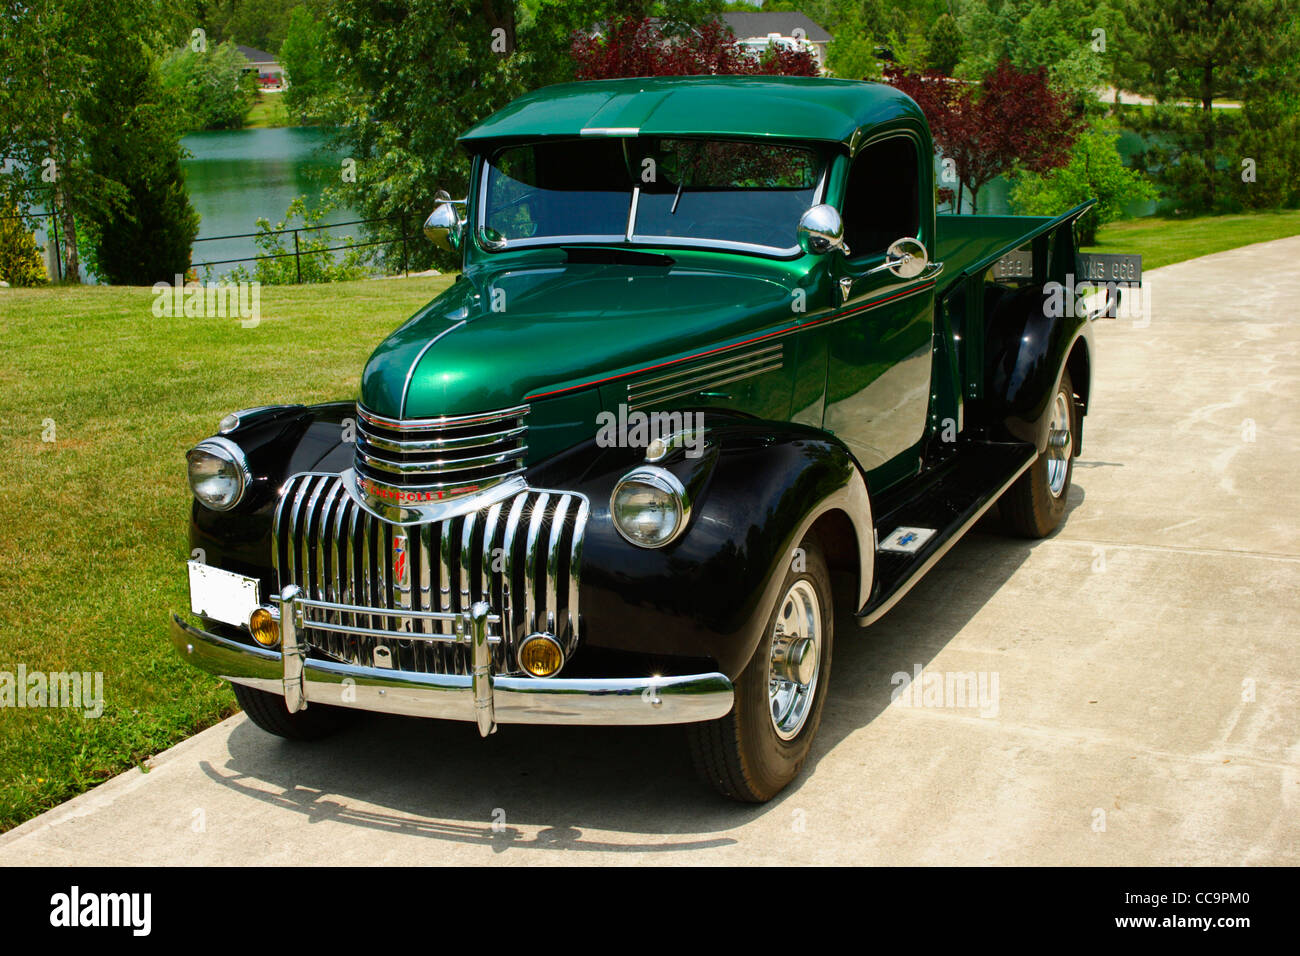 1946 Chevrolet 3/4 ton Pickup truck Stock Photo, Royalty Free ...